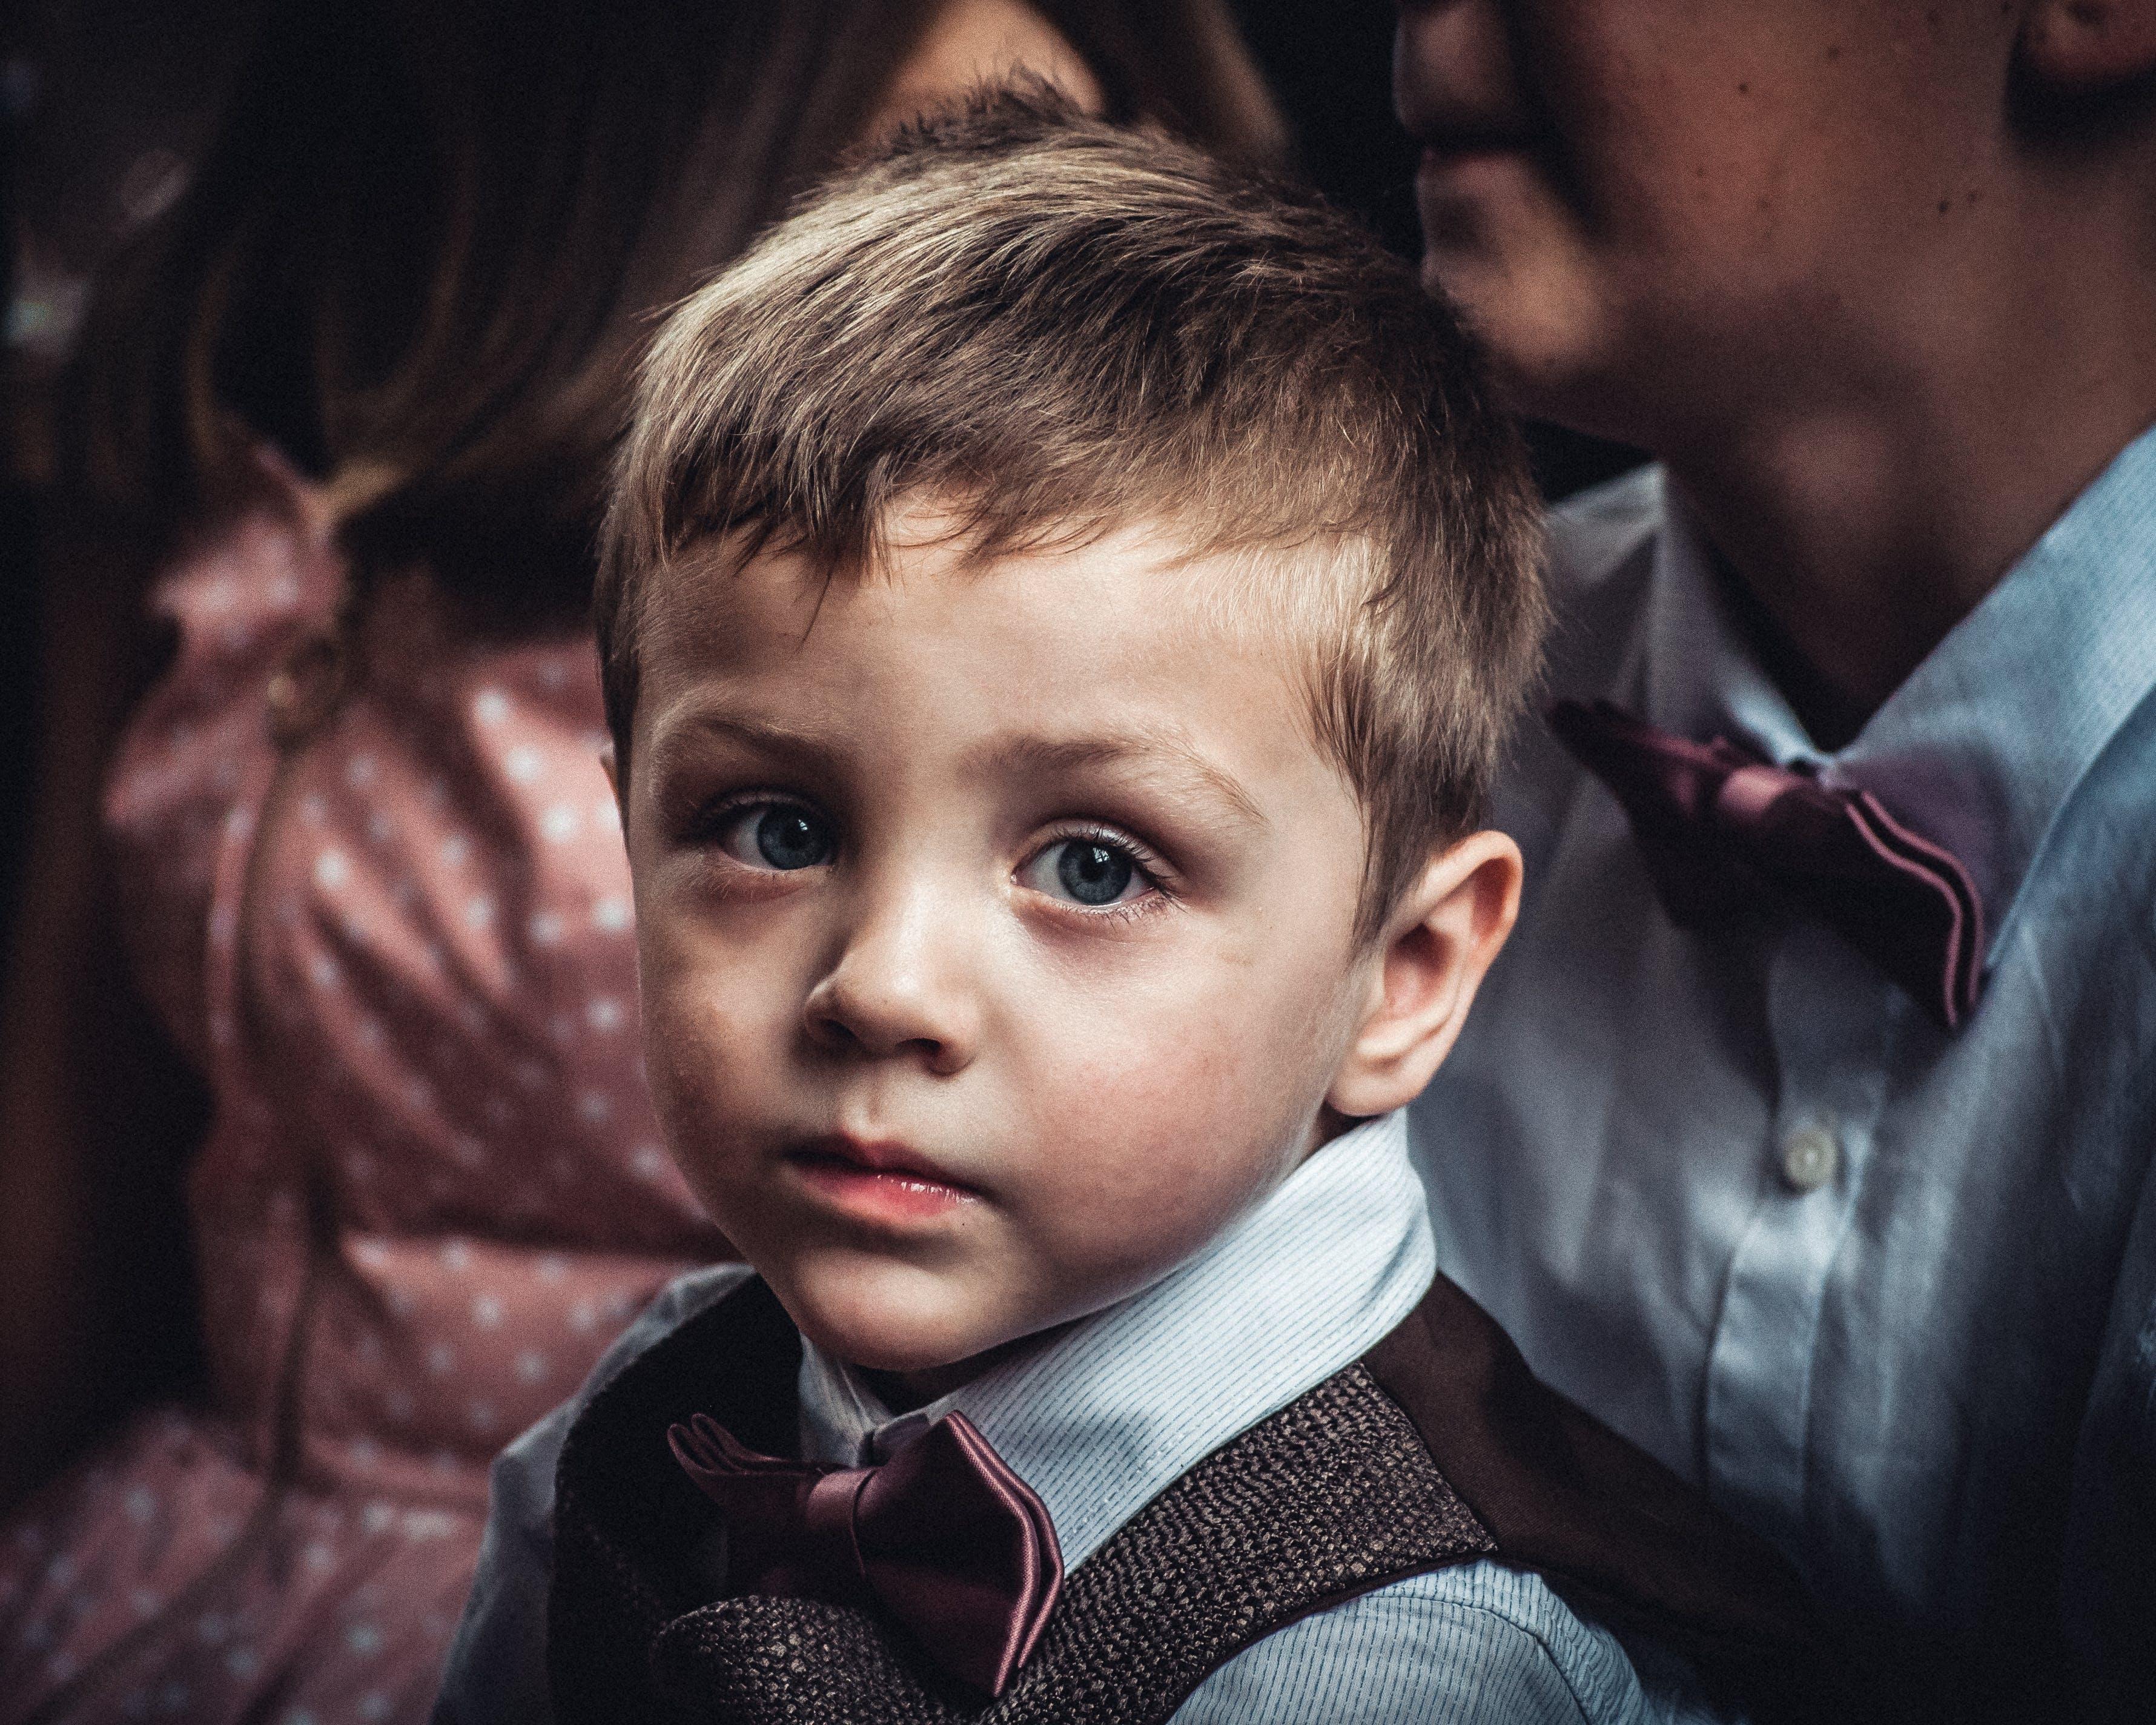 Free stock photo of little boy portrait, portrait